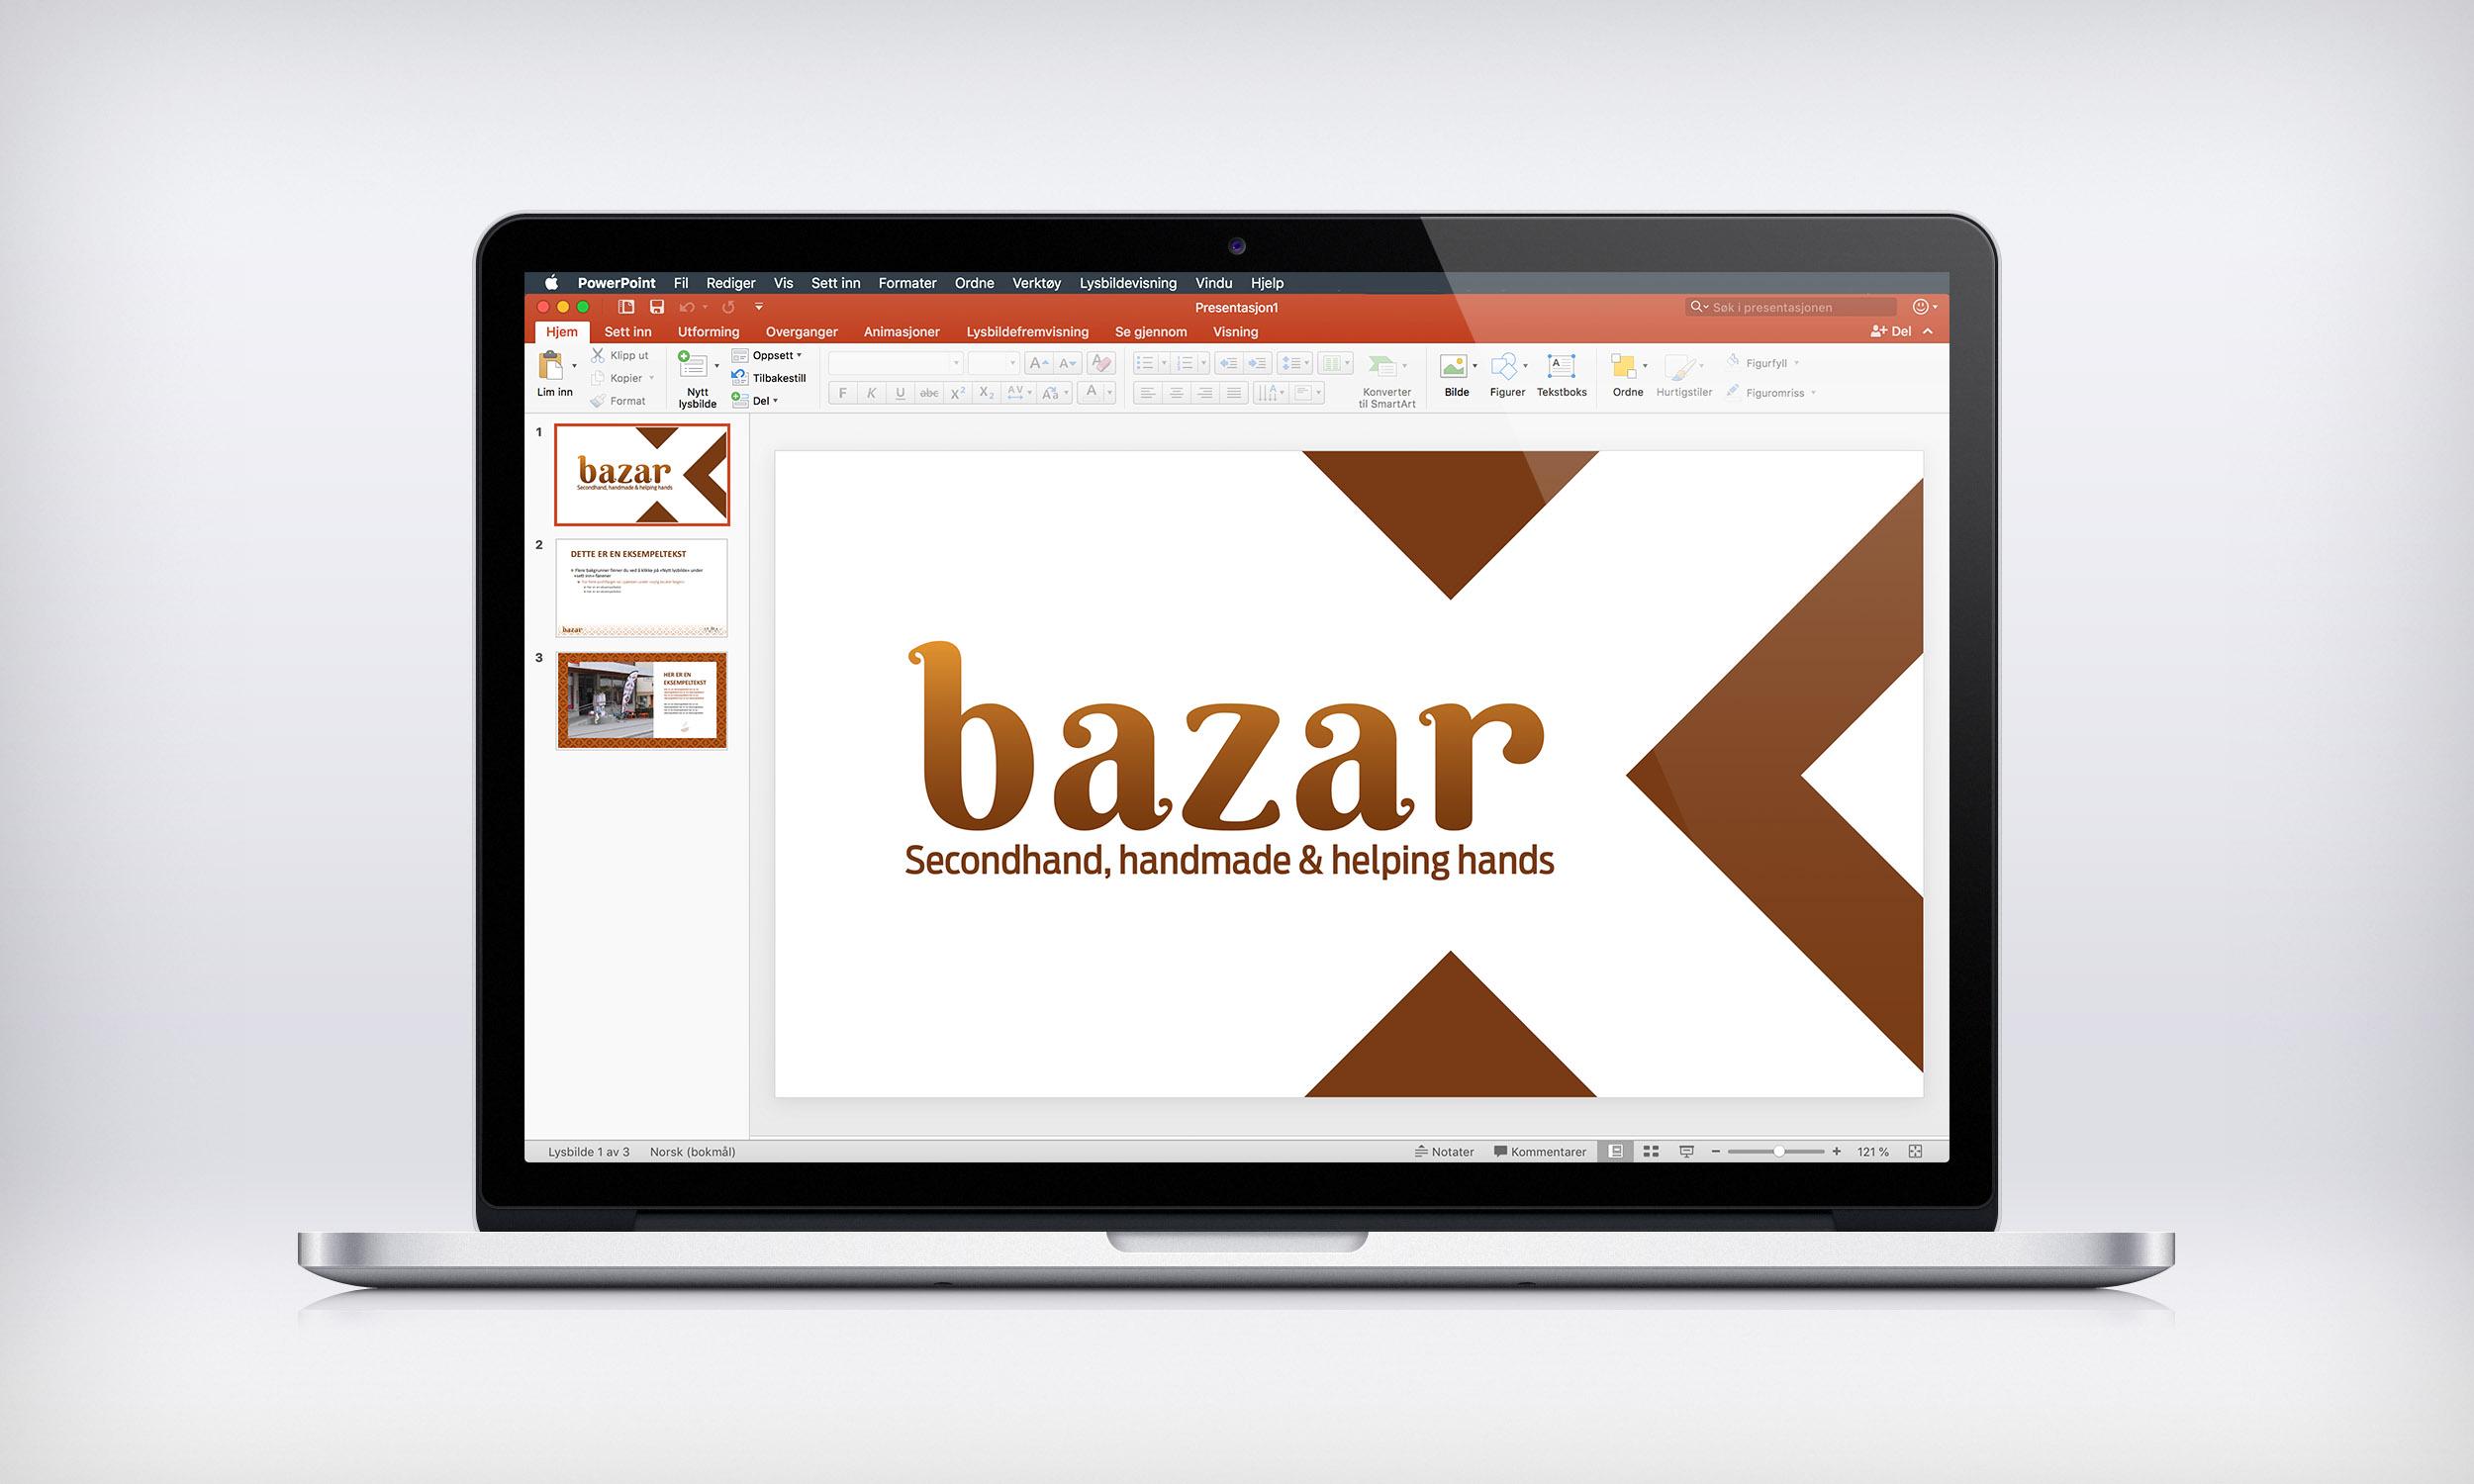 Bazar_powerpoint_mockup.jpg